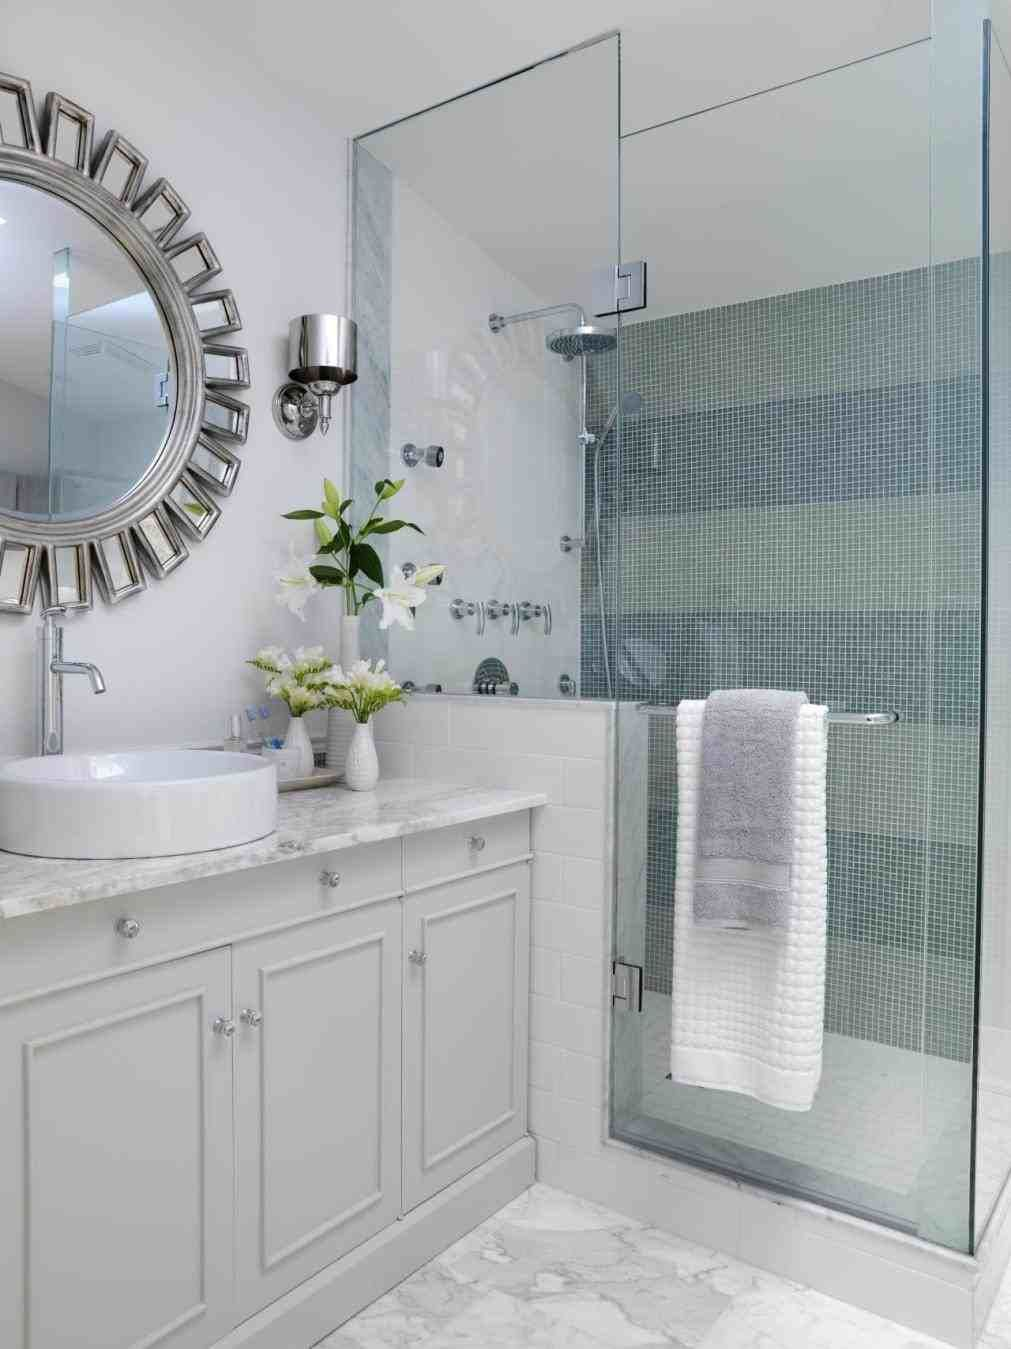 New Post Lanka Tiles Bathroom Designs Visit Bobayule Trending Decors Bathroom Tile Designs Bathroom Design Small Small Bathroom Tiles